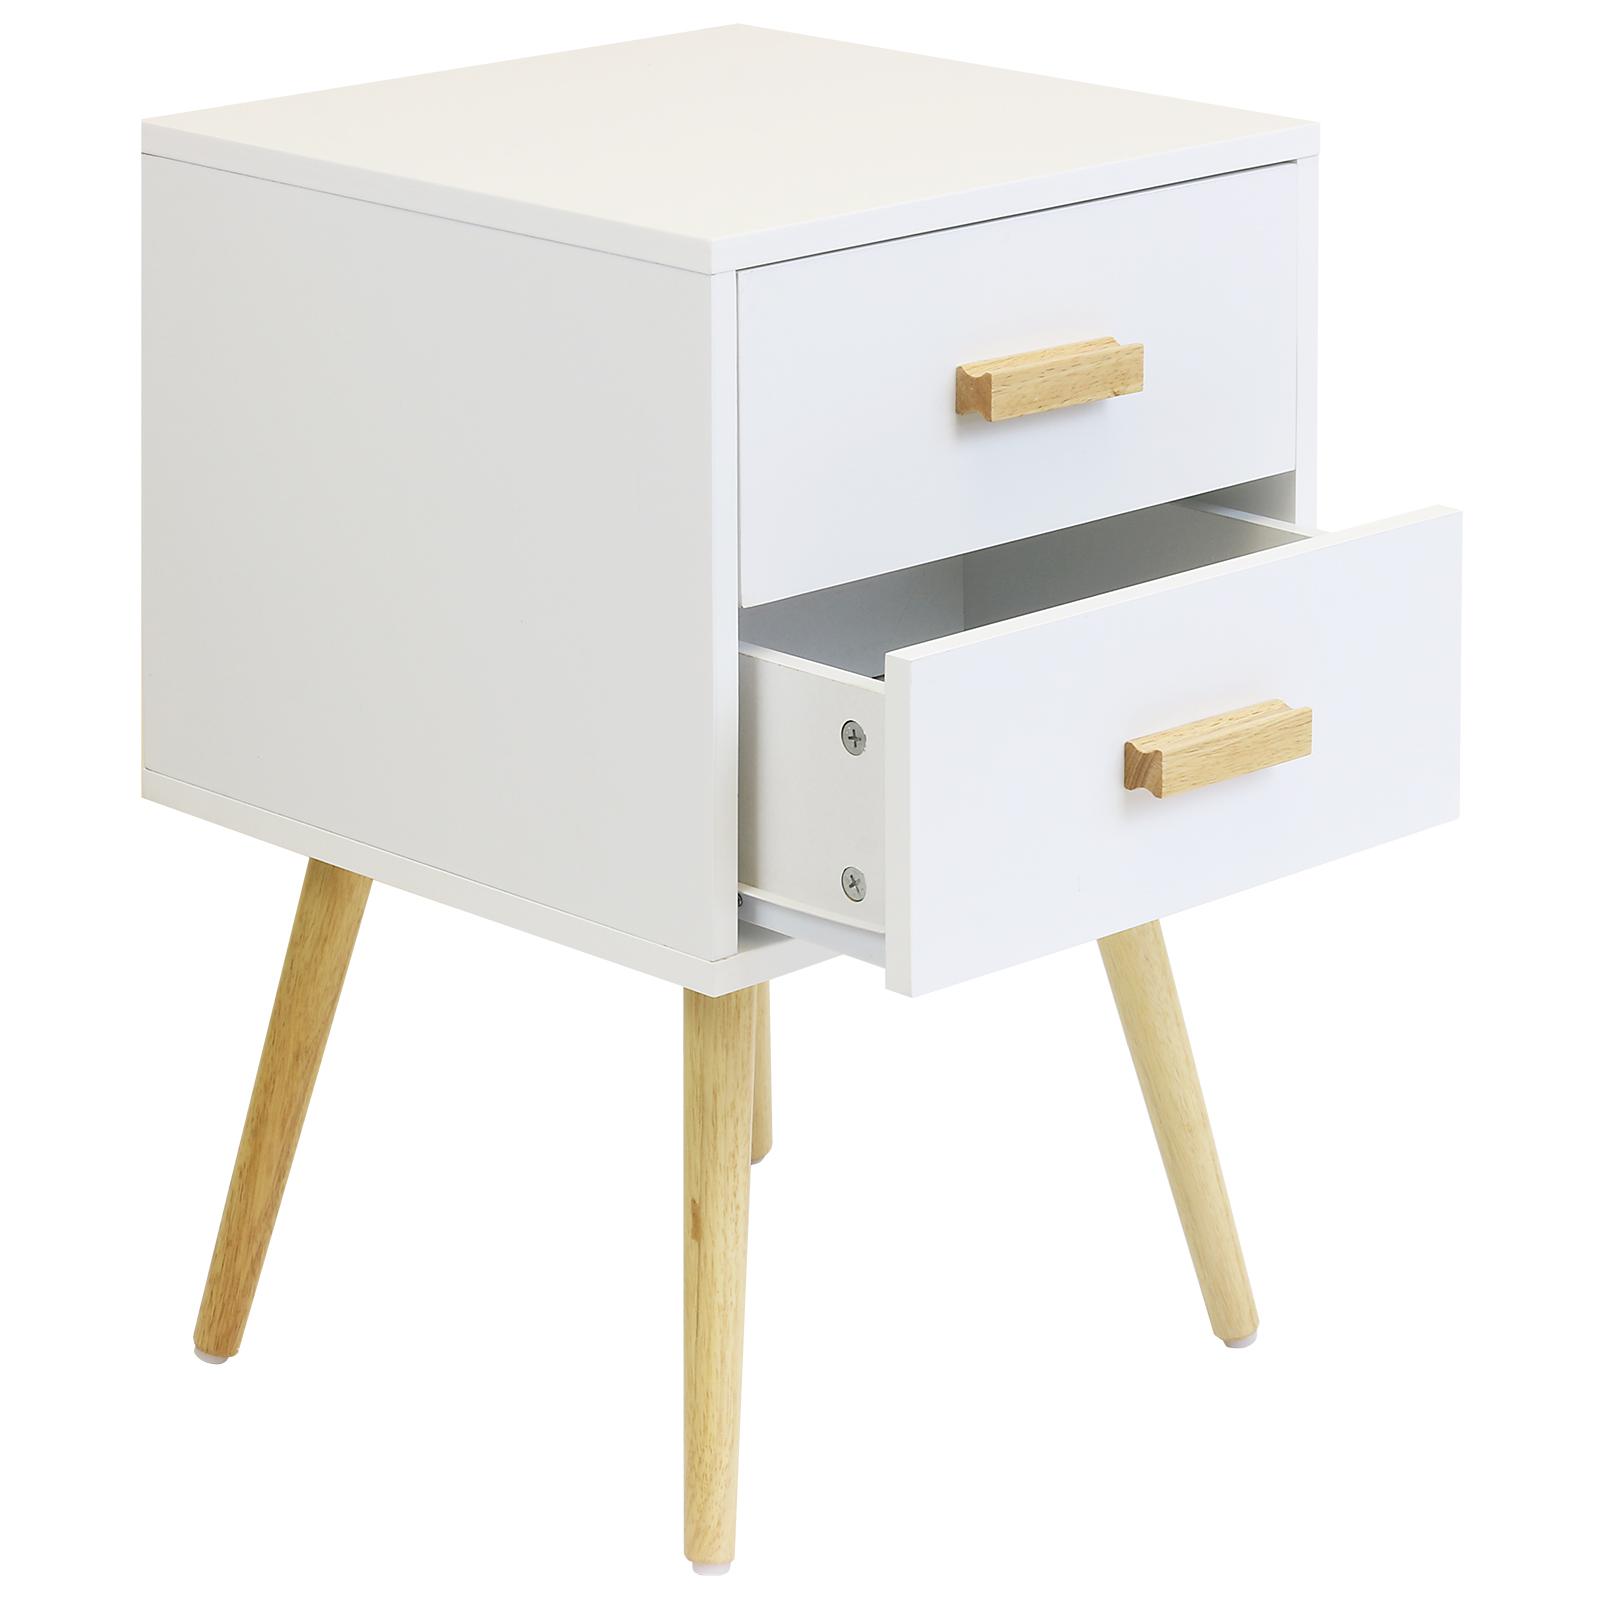 White bedside table - Sentinel Hartleys 2 Drawer White Bedside Table Wood Legs Scandinavian Retro Bedroom Unit